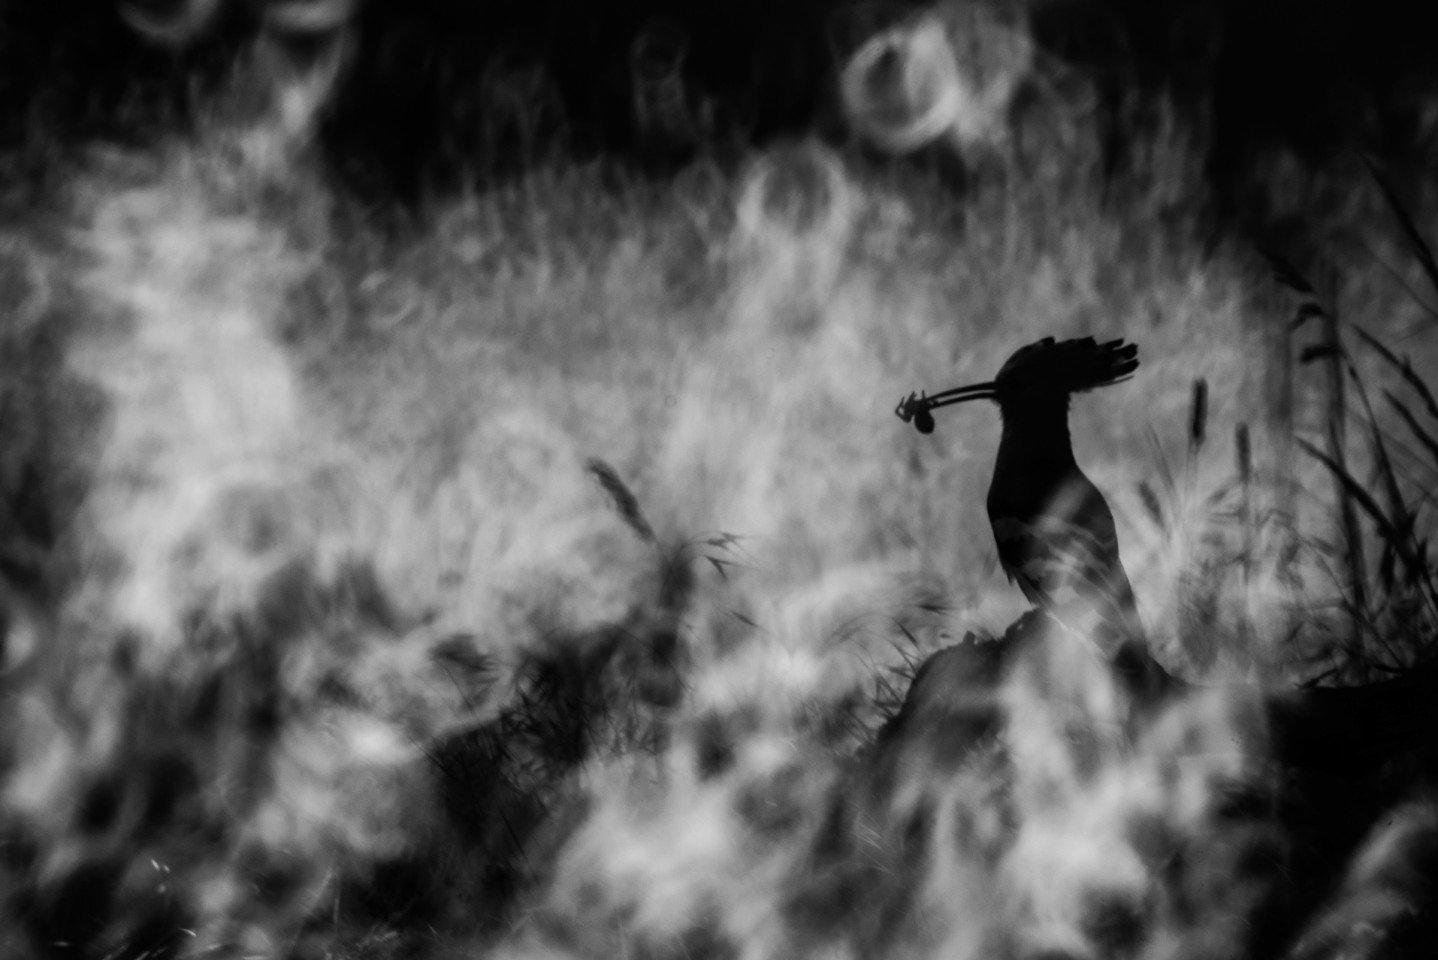 Common Hoopoe تصاویر برگزیده مسابقه عکاسی پرندگان ۲۰۲۰ مشخص شدند اخبار IT